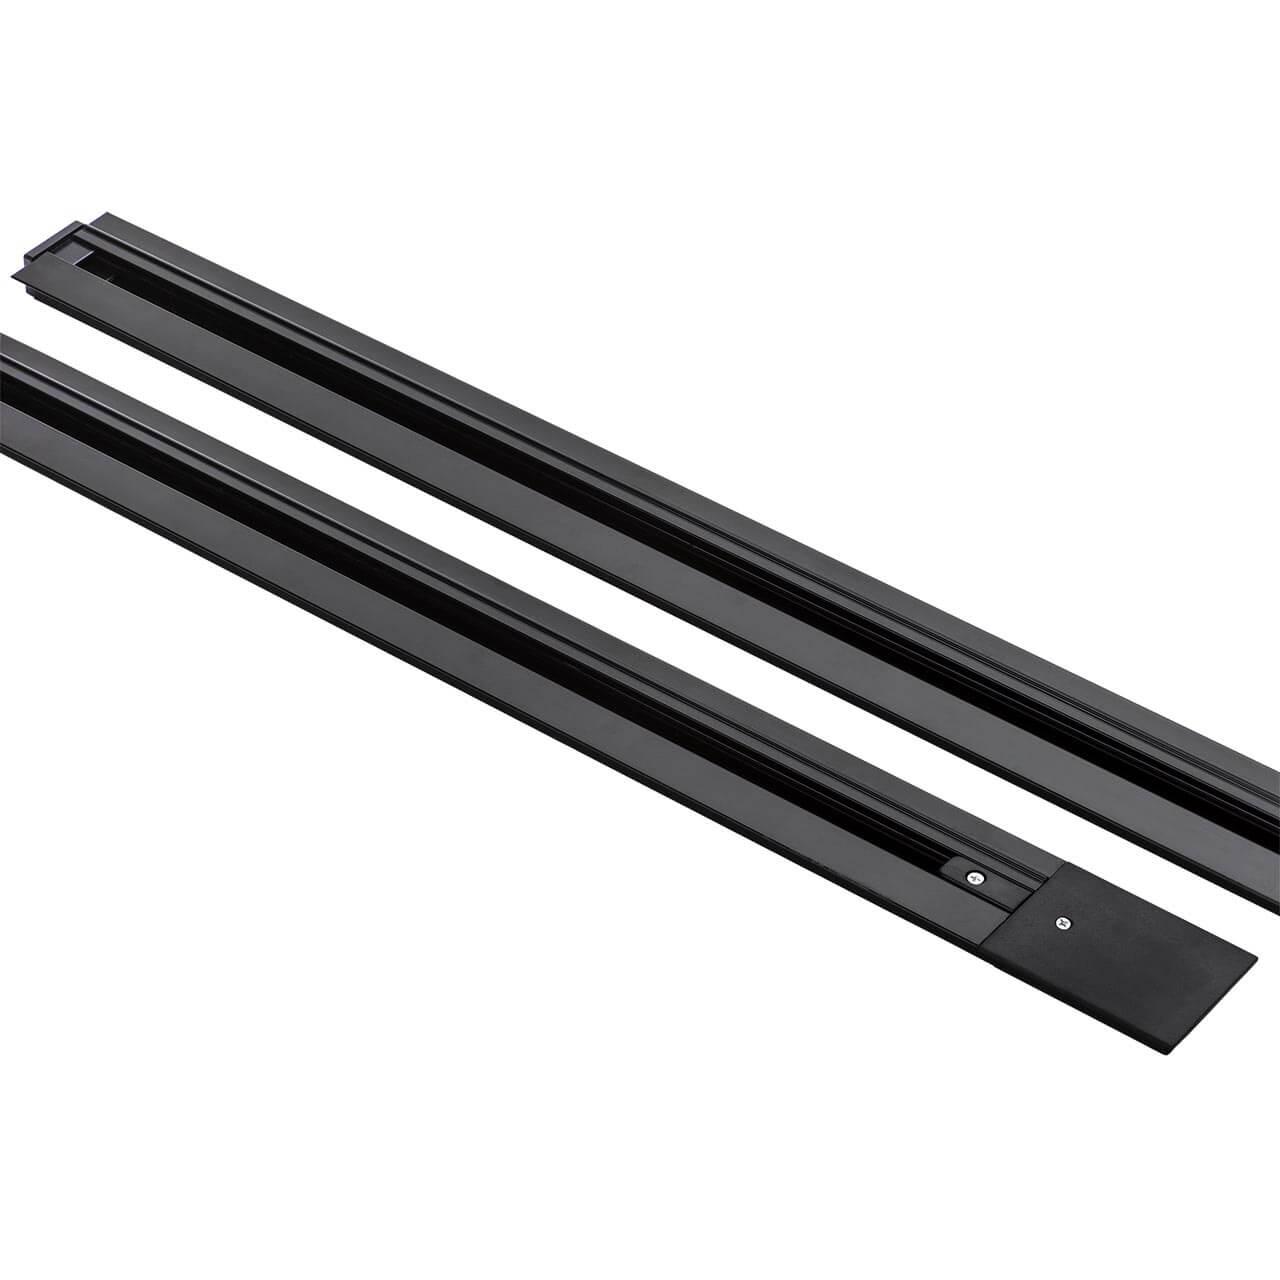 Шинопровод Lightstar 501028 Barra шинопровод однофазный lightstar barra 502027